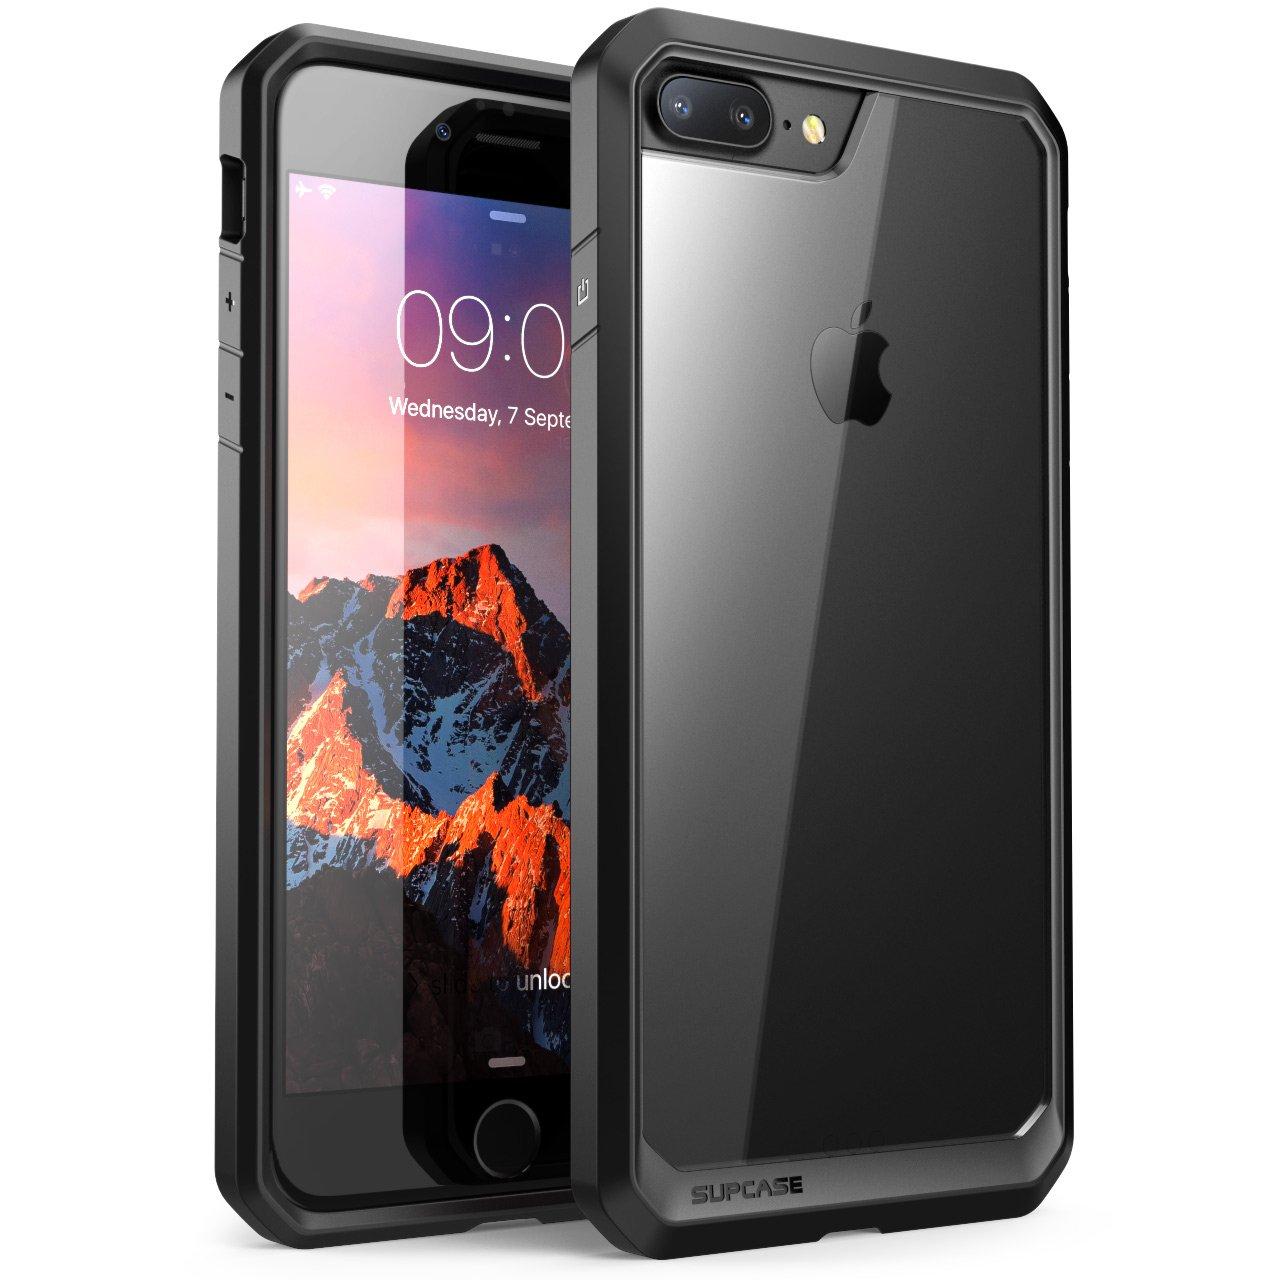 iPhone 8 Plus Case, SUPCASE Unicorn Beetle Series Premium Hybrid Protective Clear Case for Apple iPhone 7 Plus 2016 / iPhone 8 Plus 2017 Release (Black)